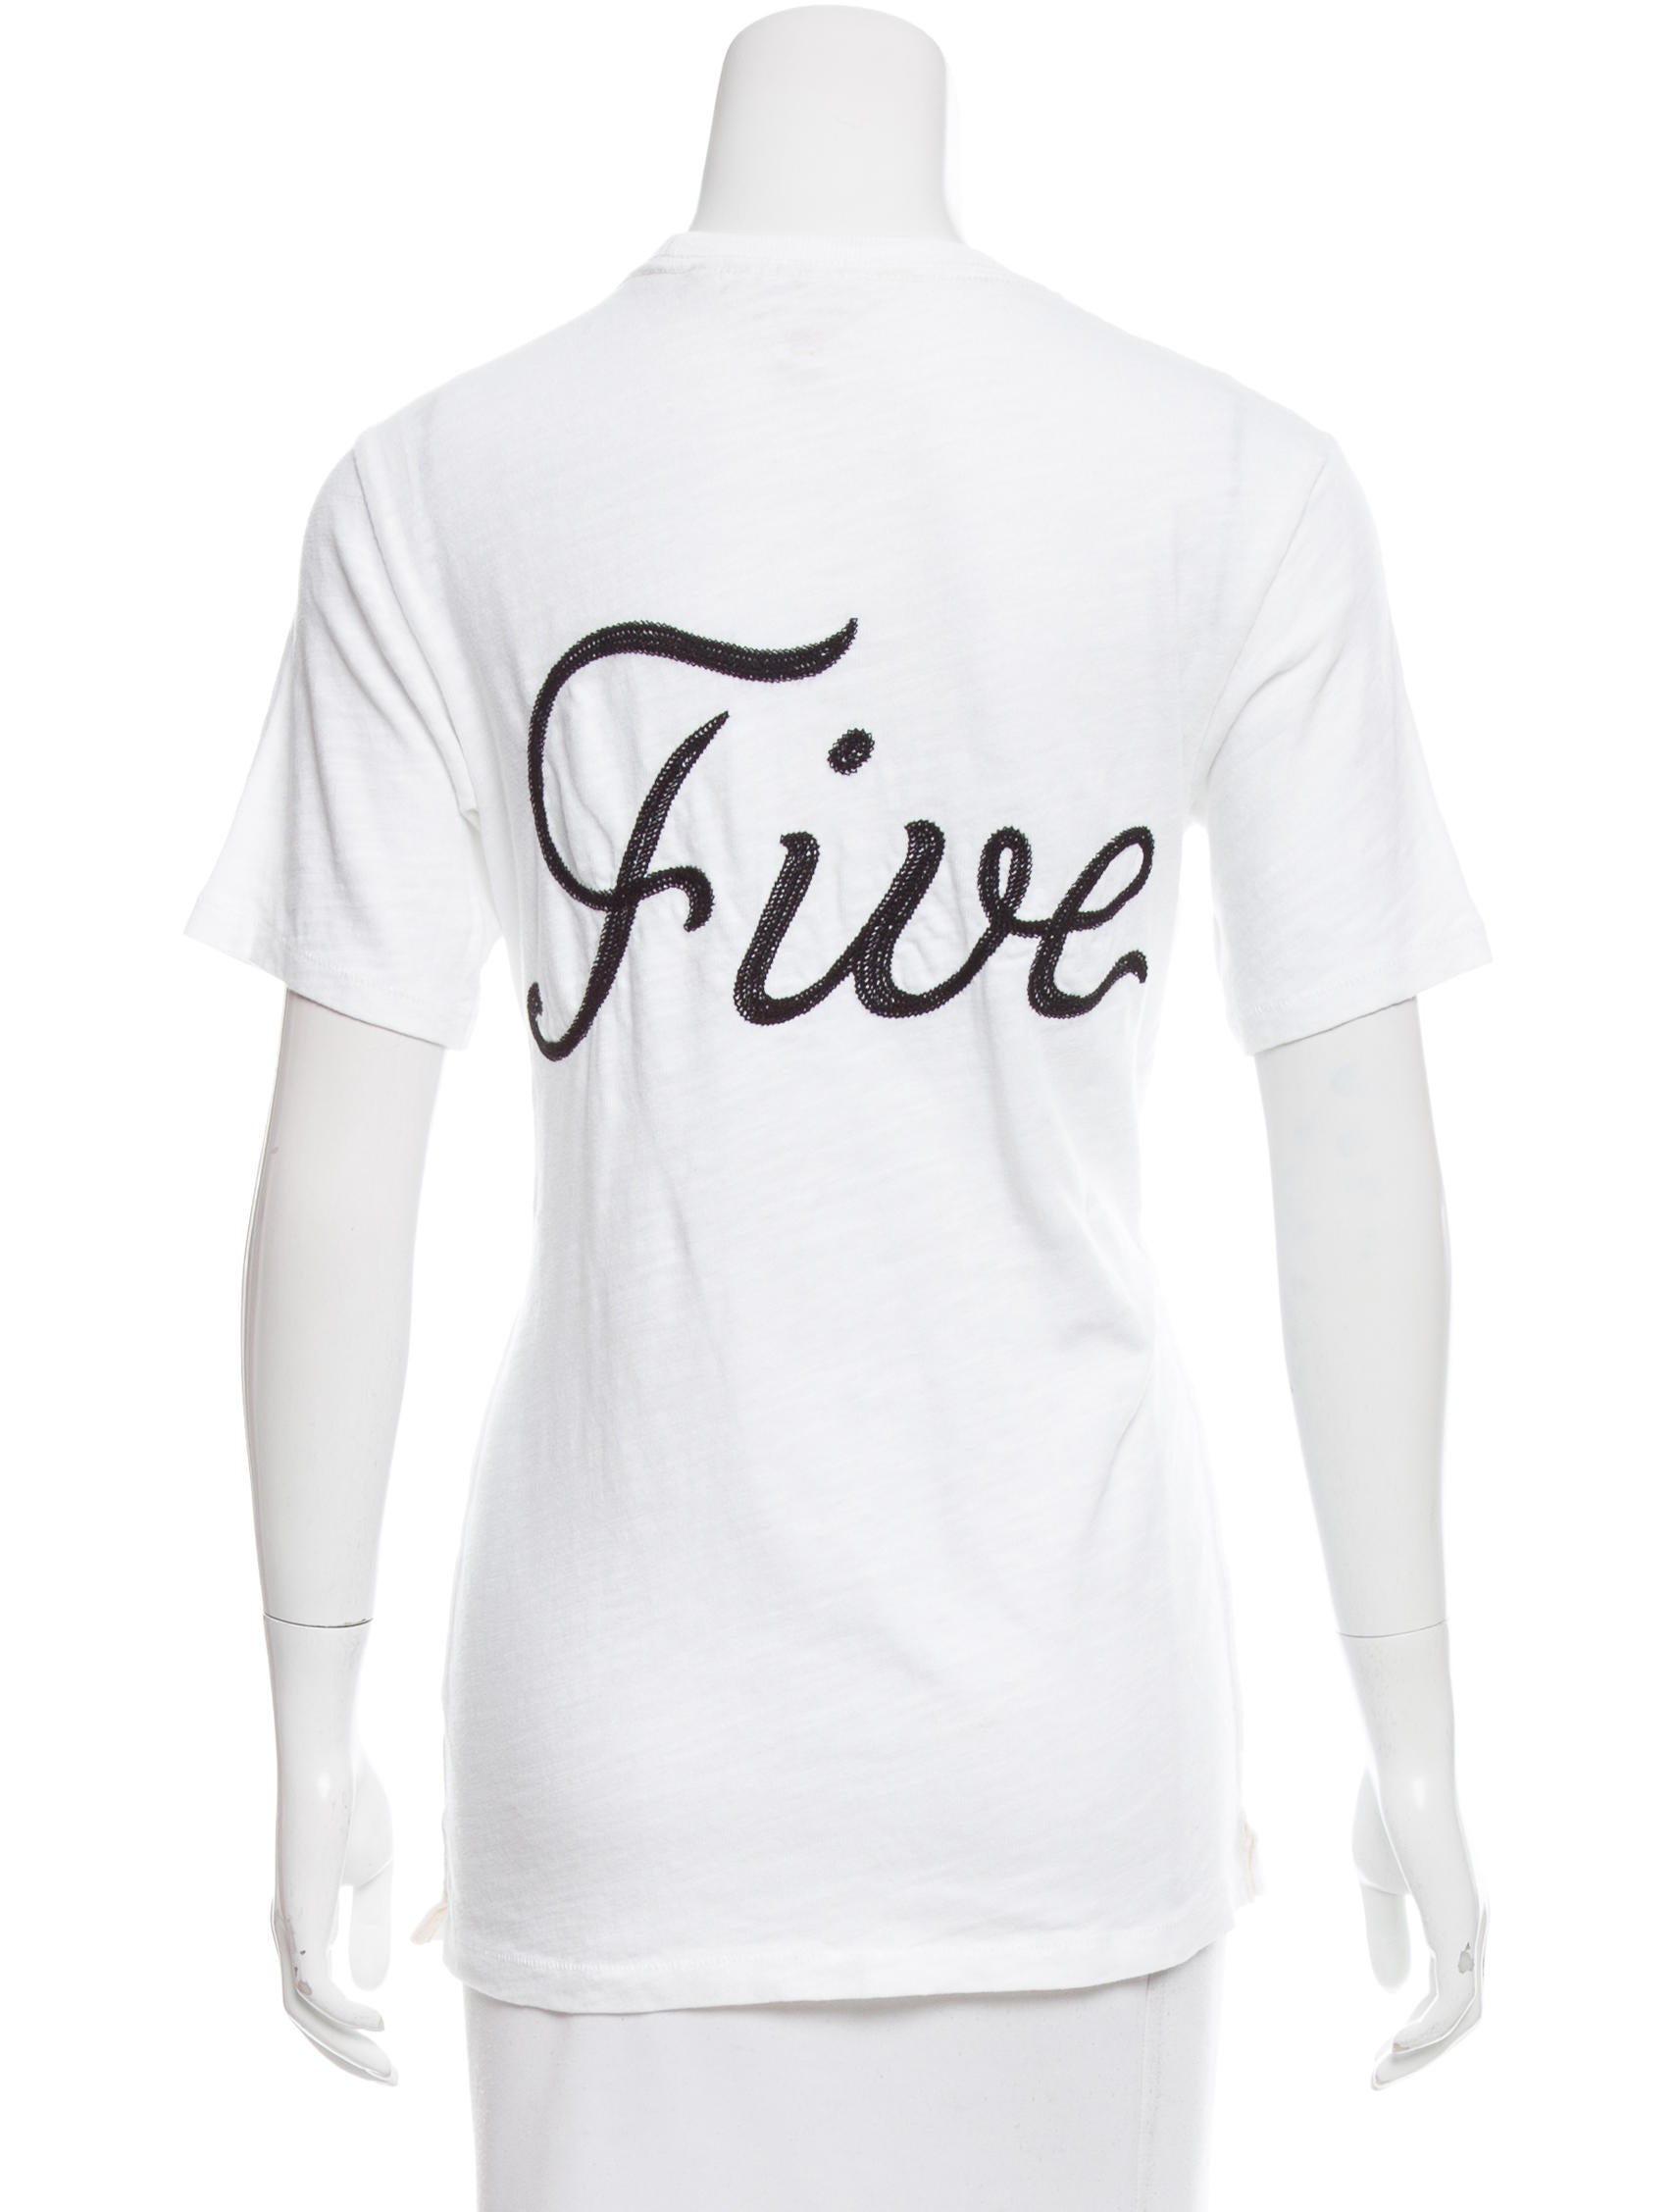 Rag bone embroidered t shirt clothing wragb82975 for Rag and bone white t shirt